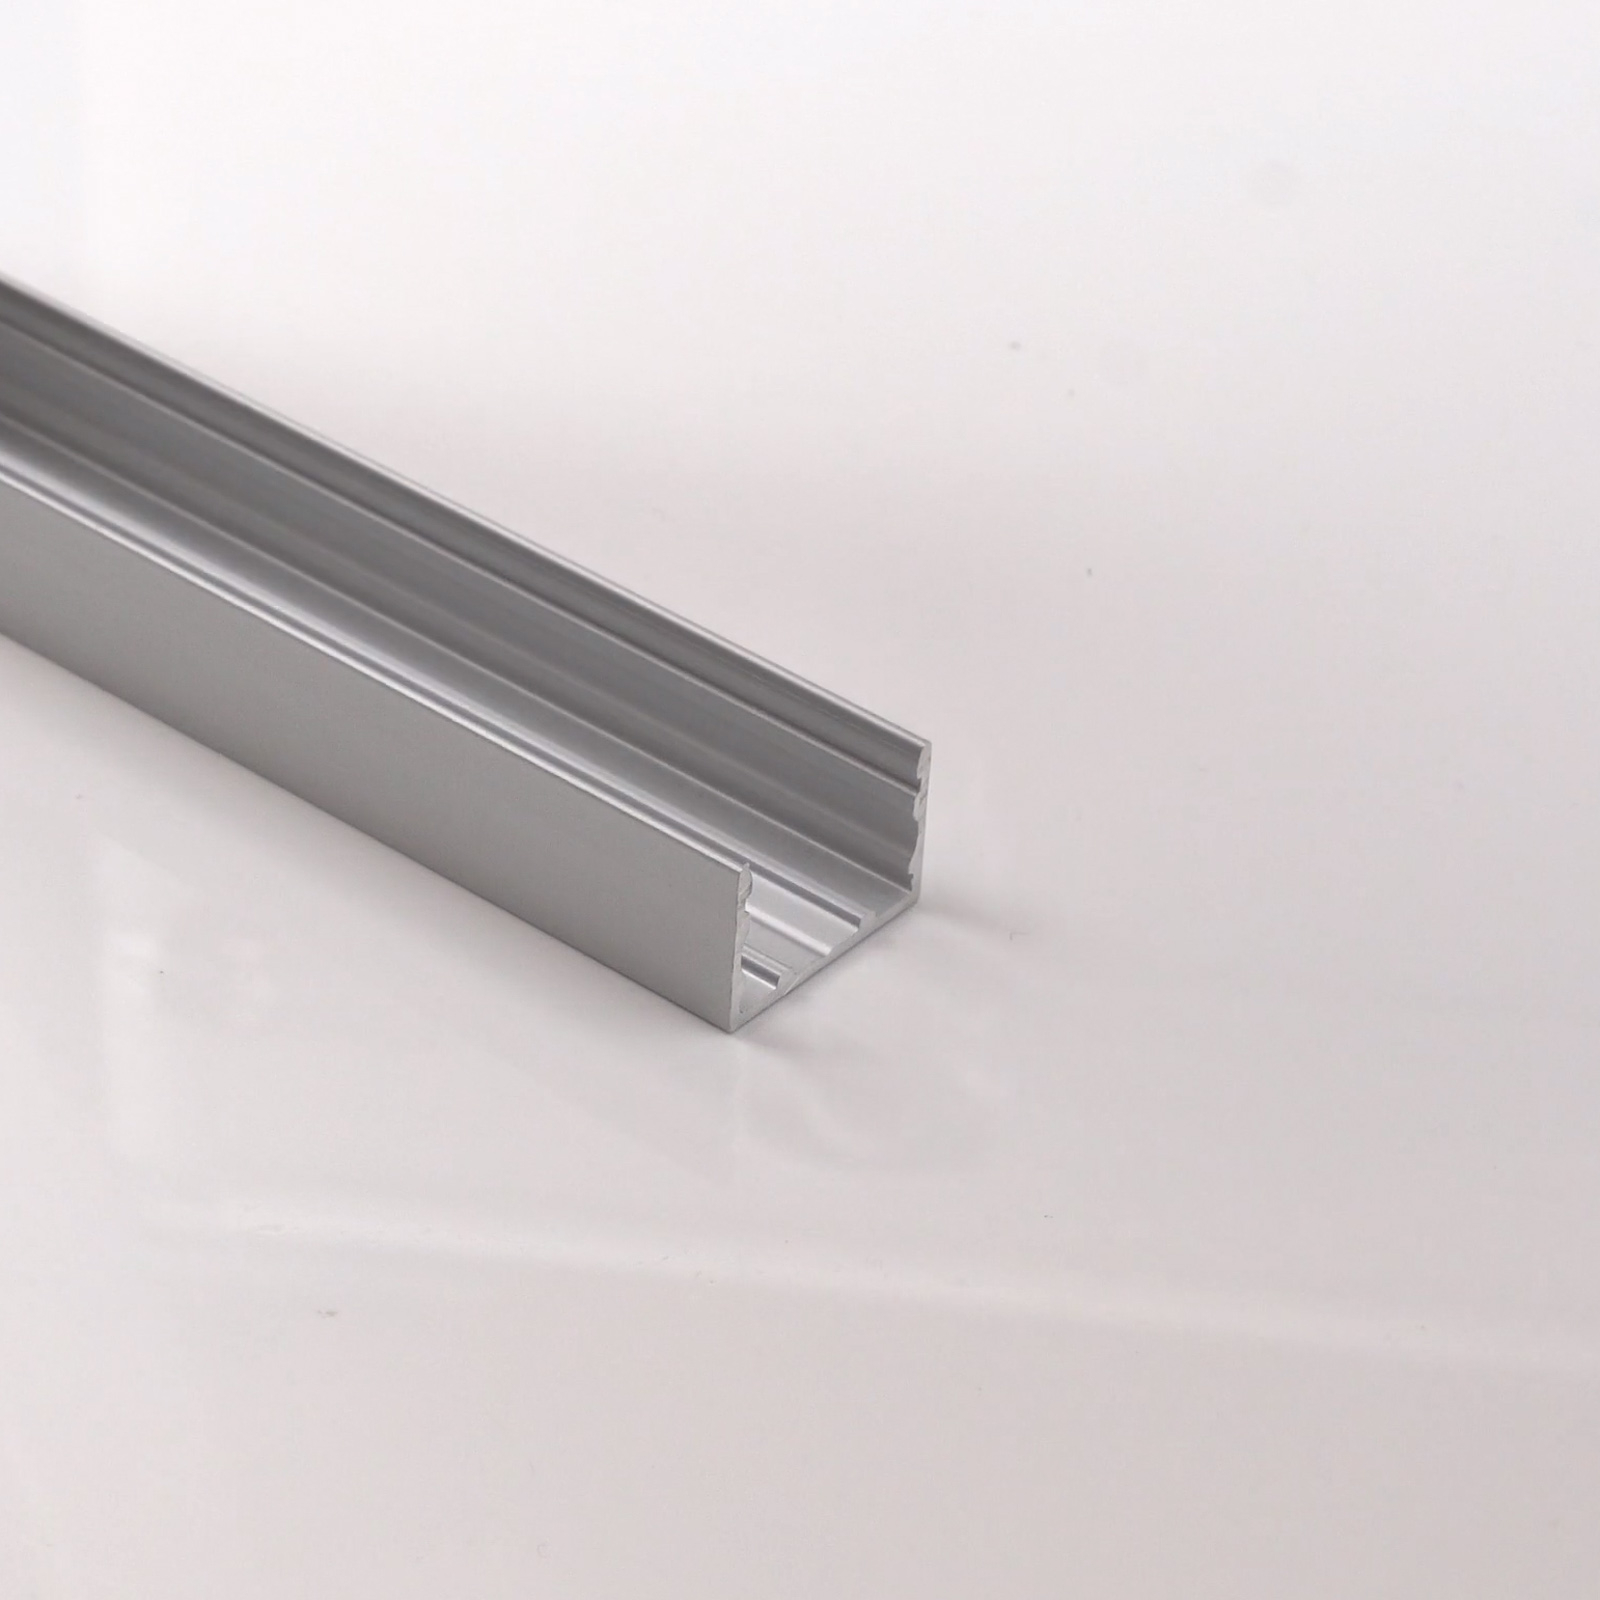 SLC Profil 96,5 cm für LED-Strip 230V IP65